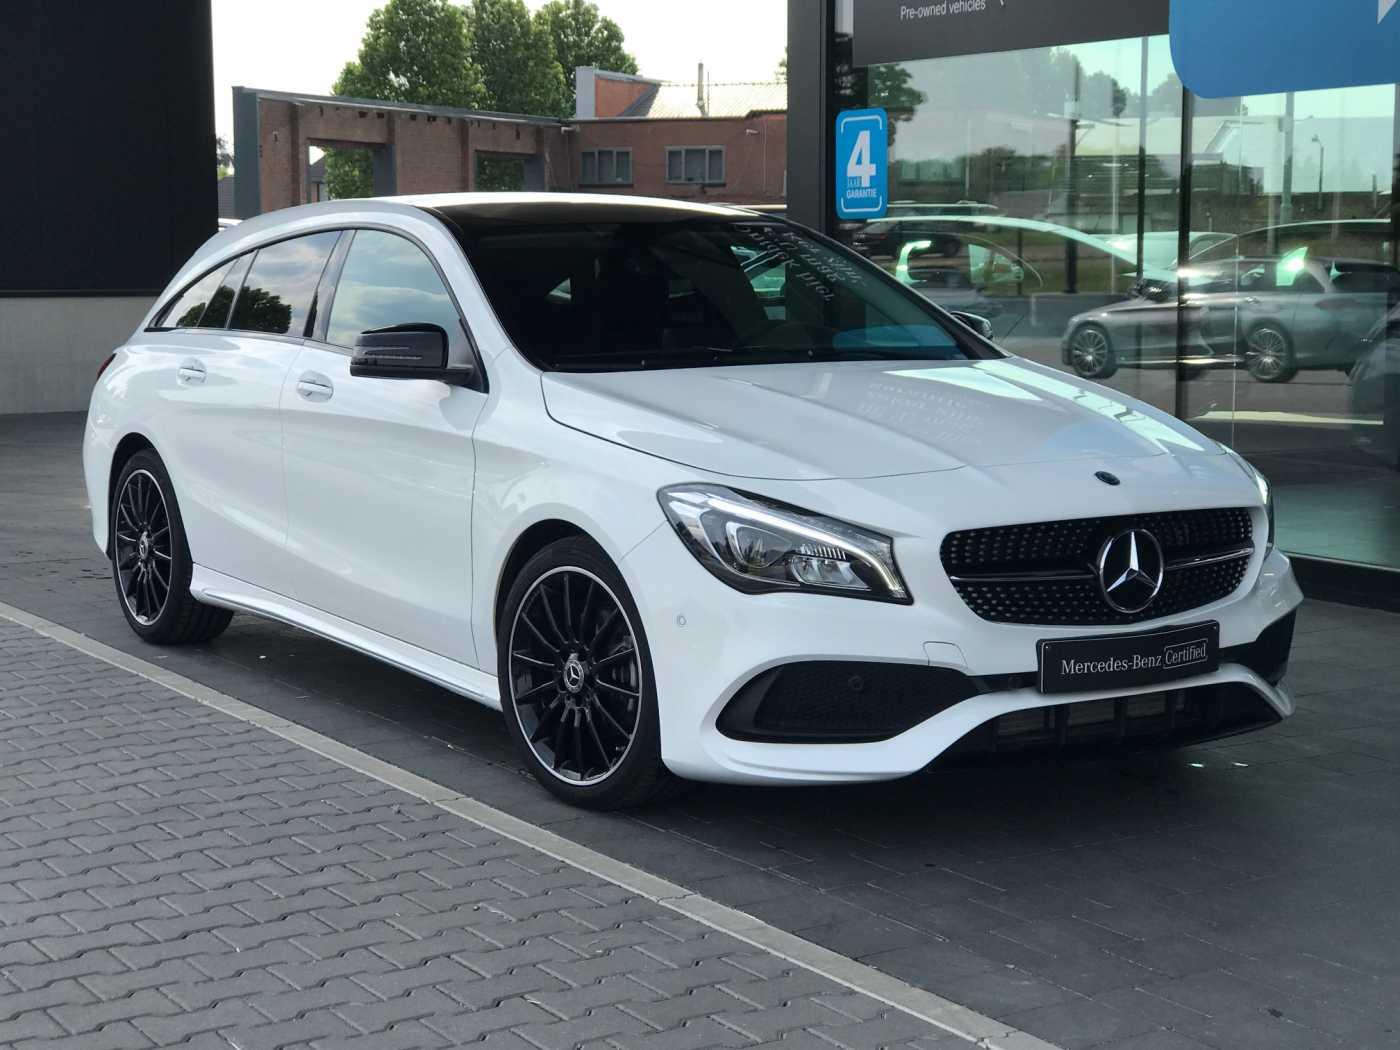 Mercedes CLA 200 4/13